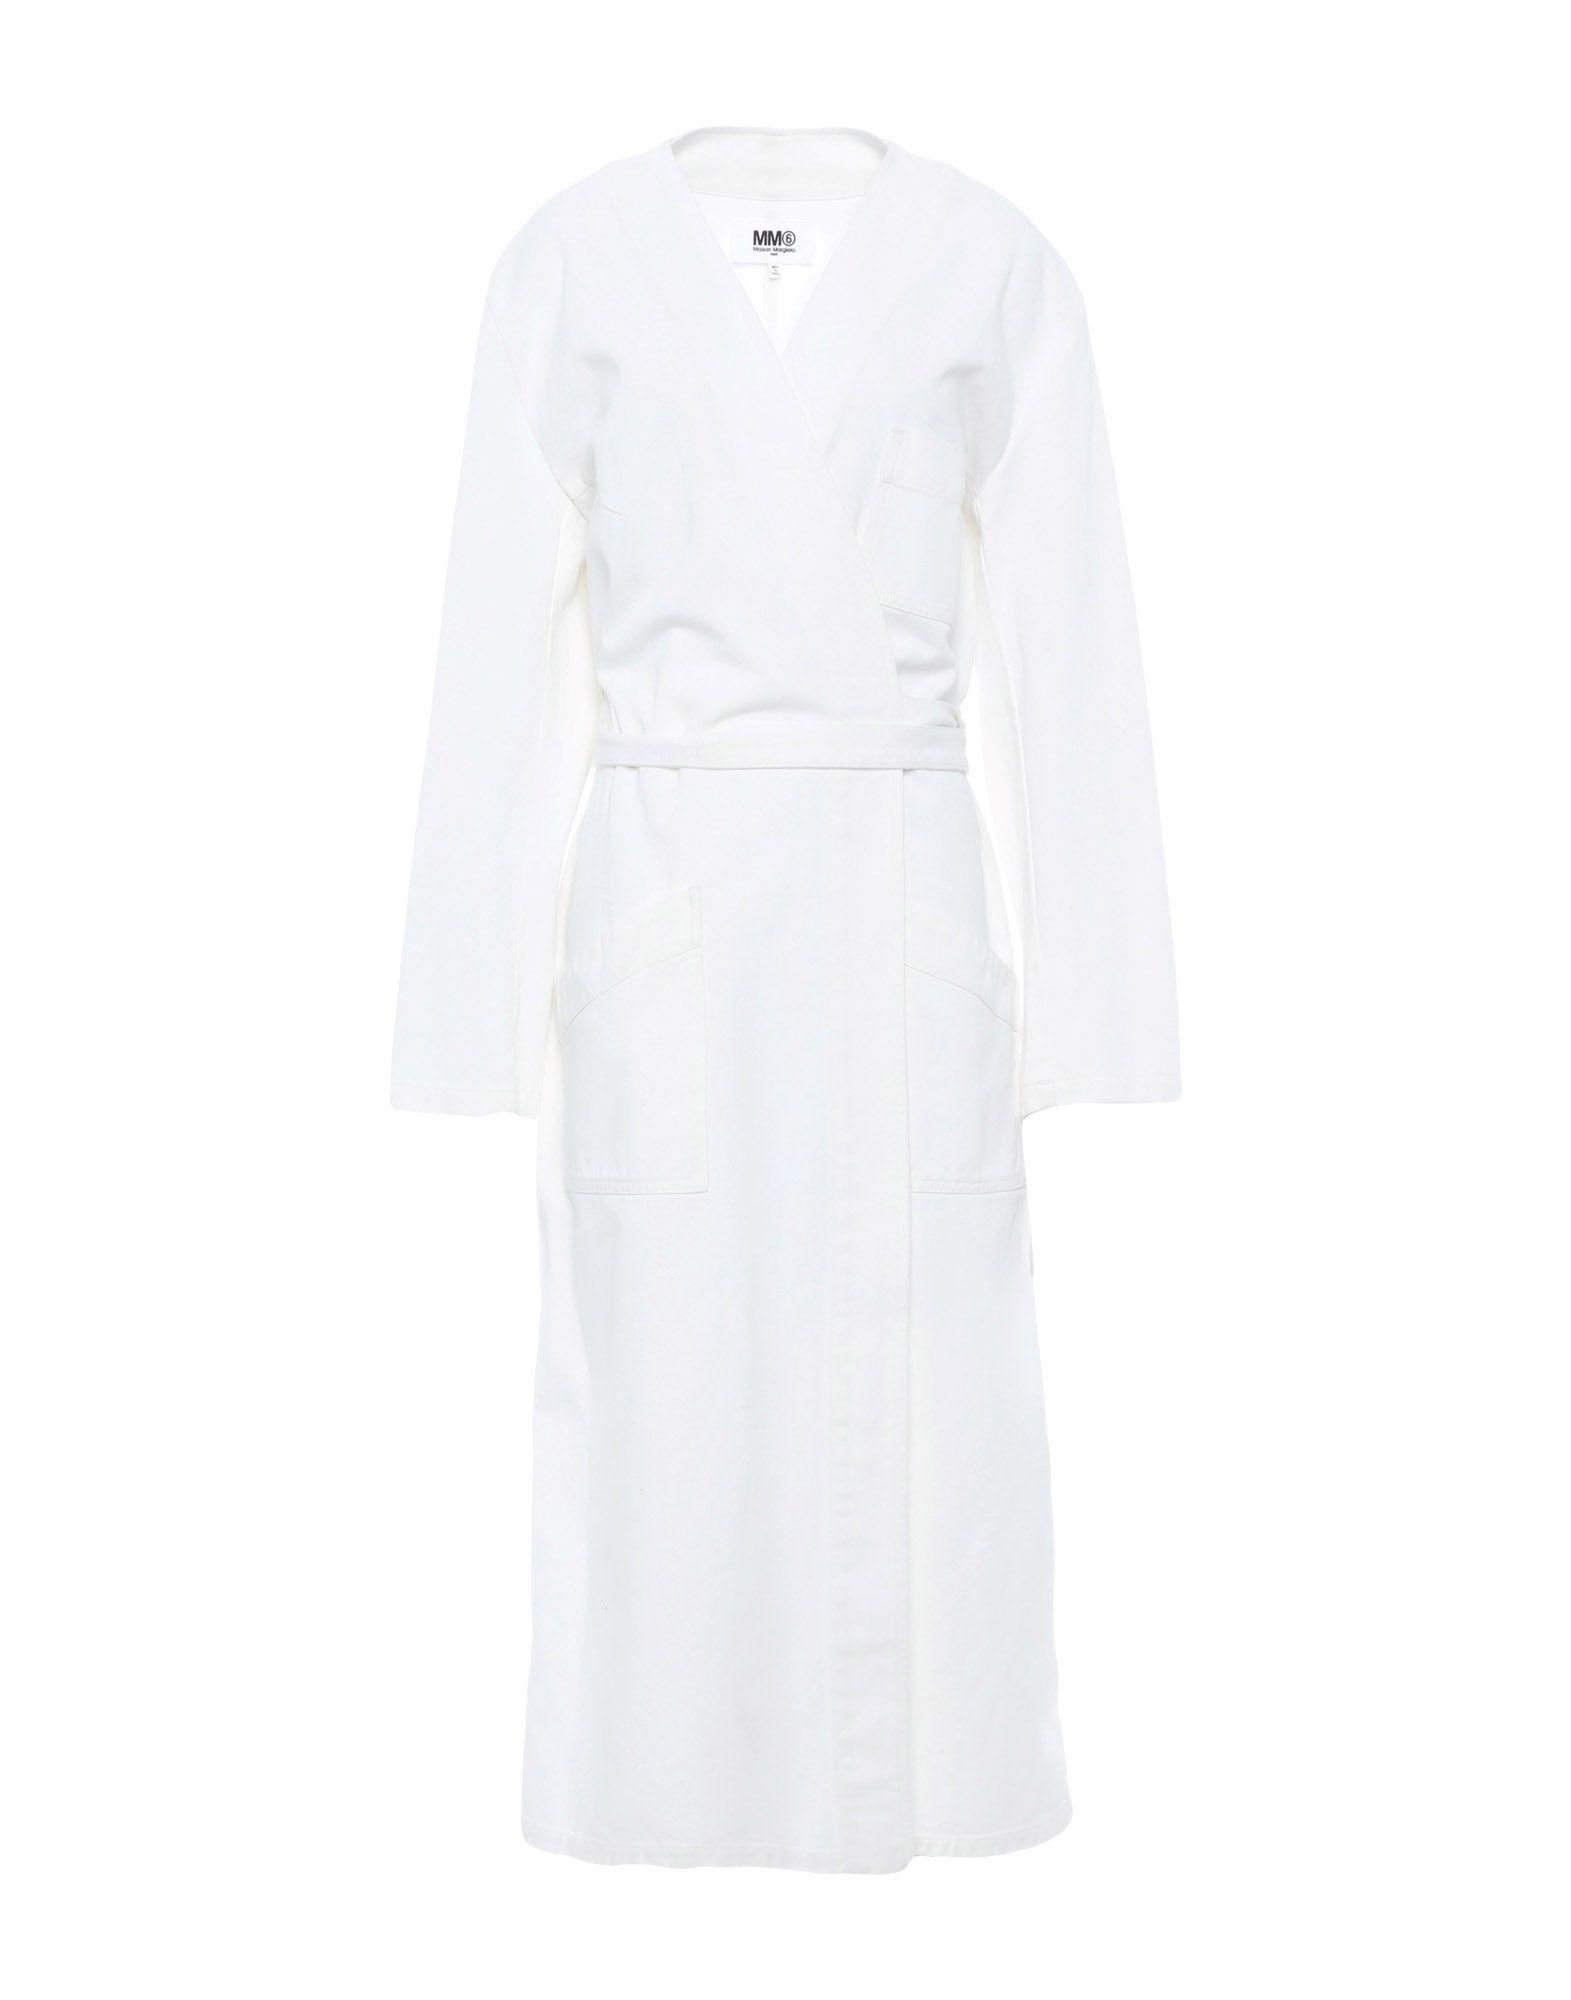 MM6 MAISON MARGIELA Джинсовая верхняя одежда maison g o c o джинсовая верхняя одежда